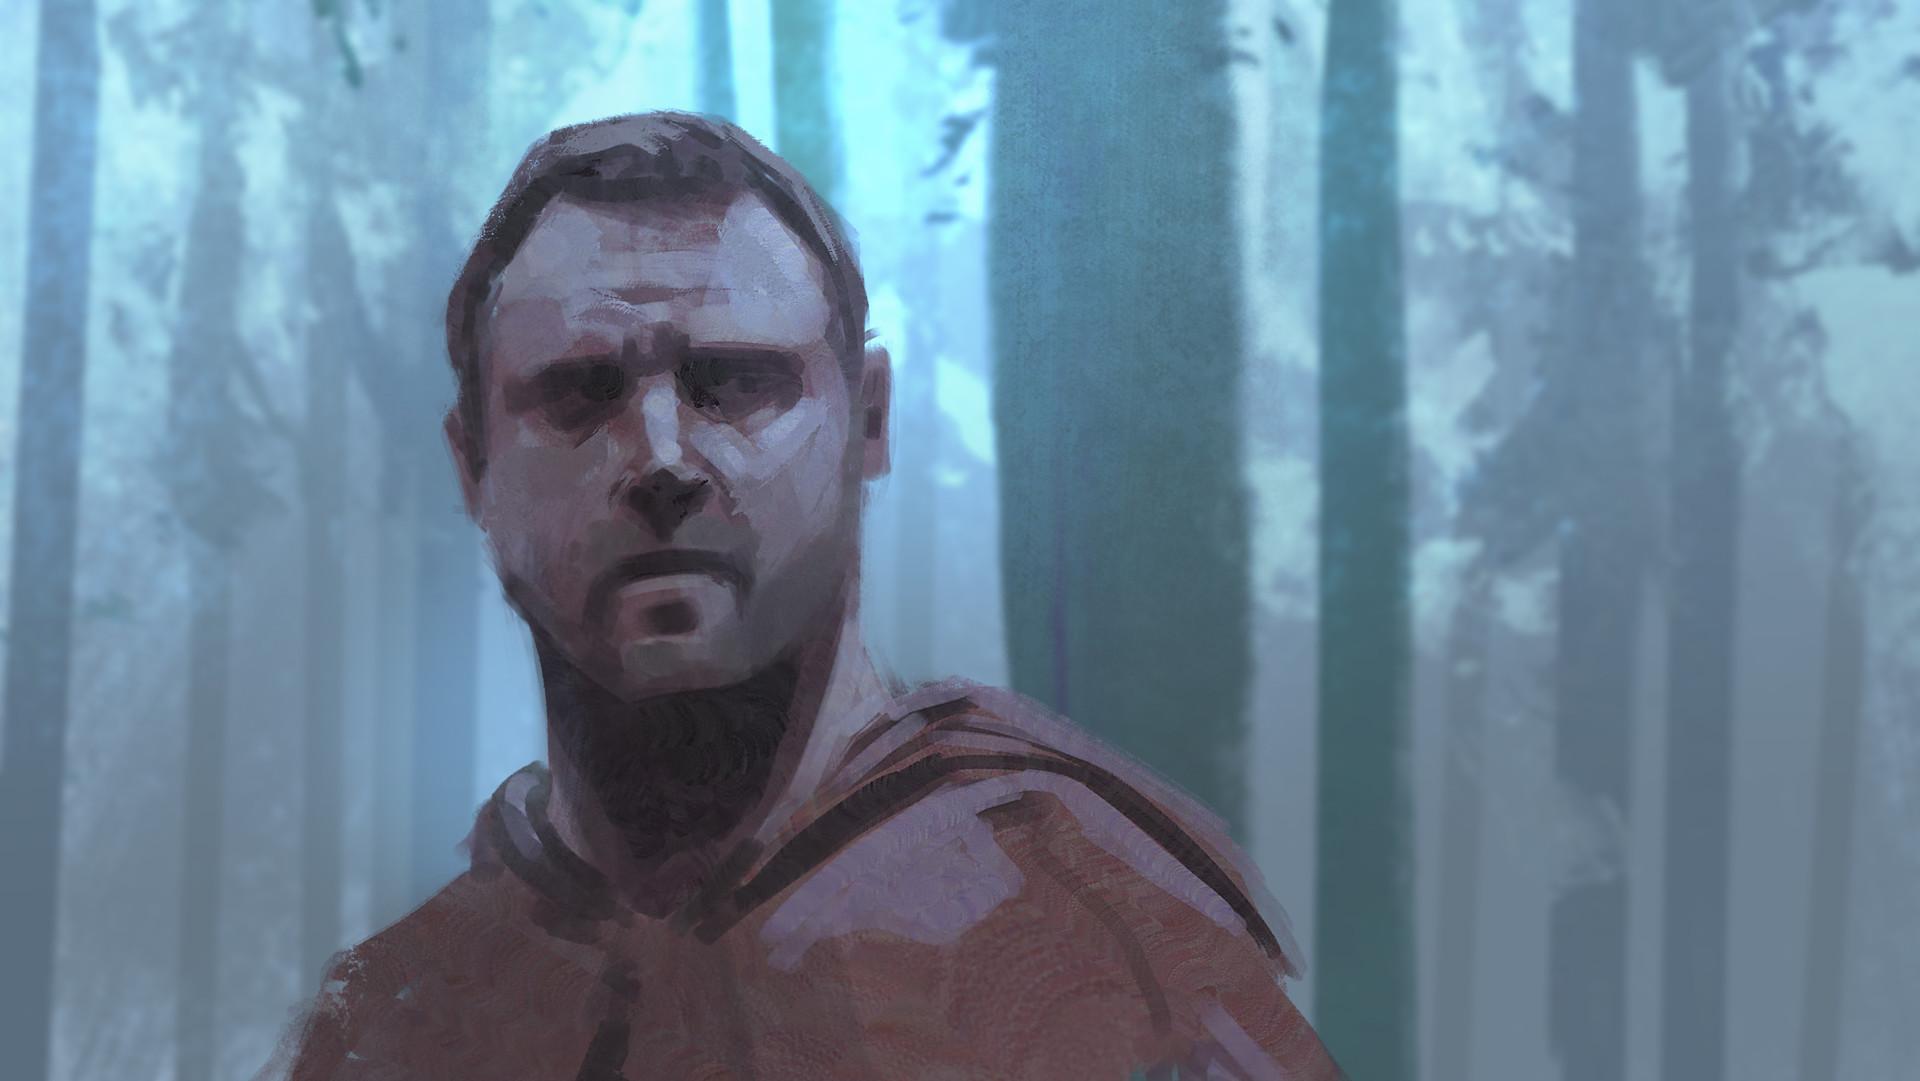 Jedd chevrier portrait sketch